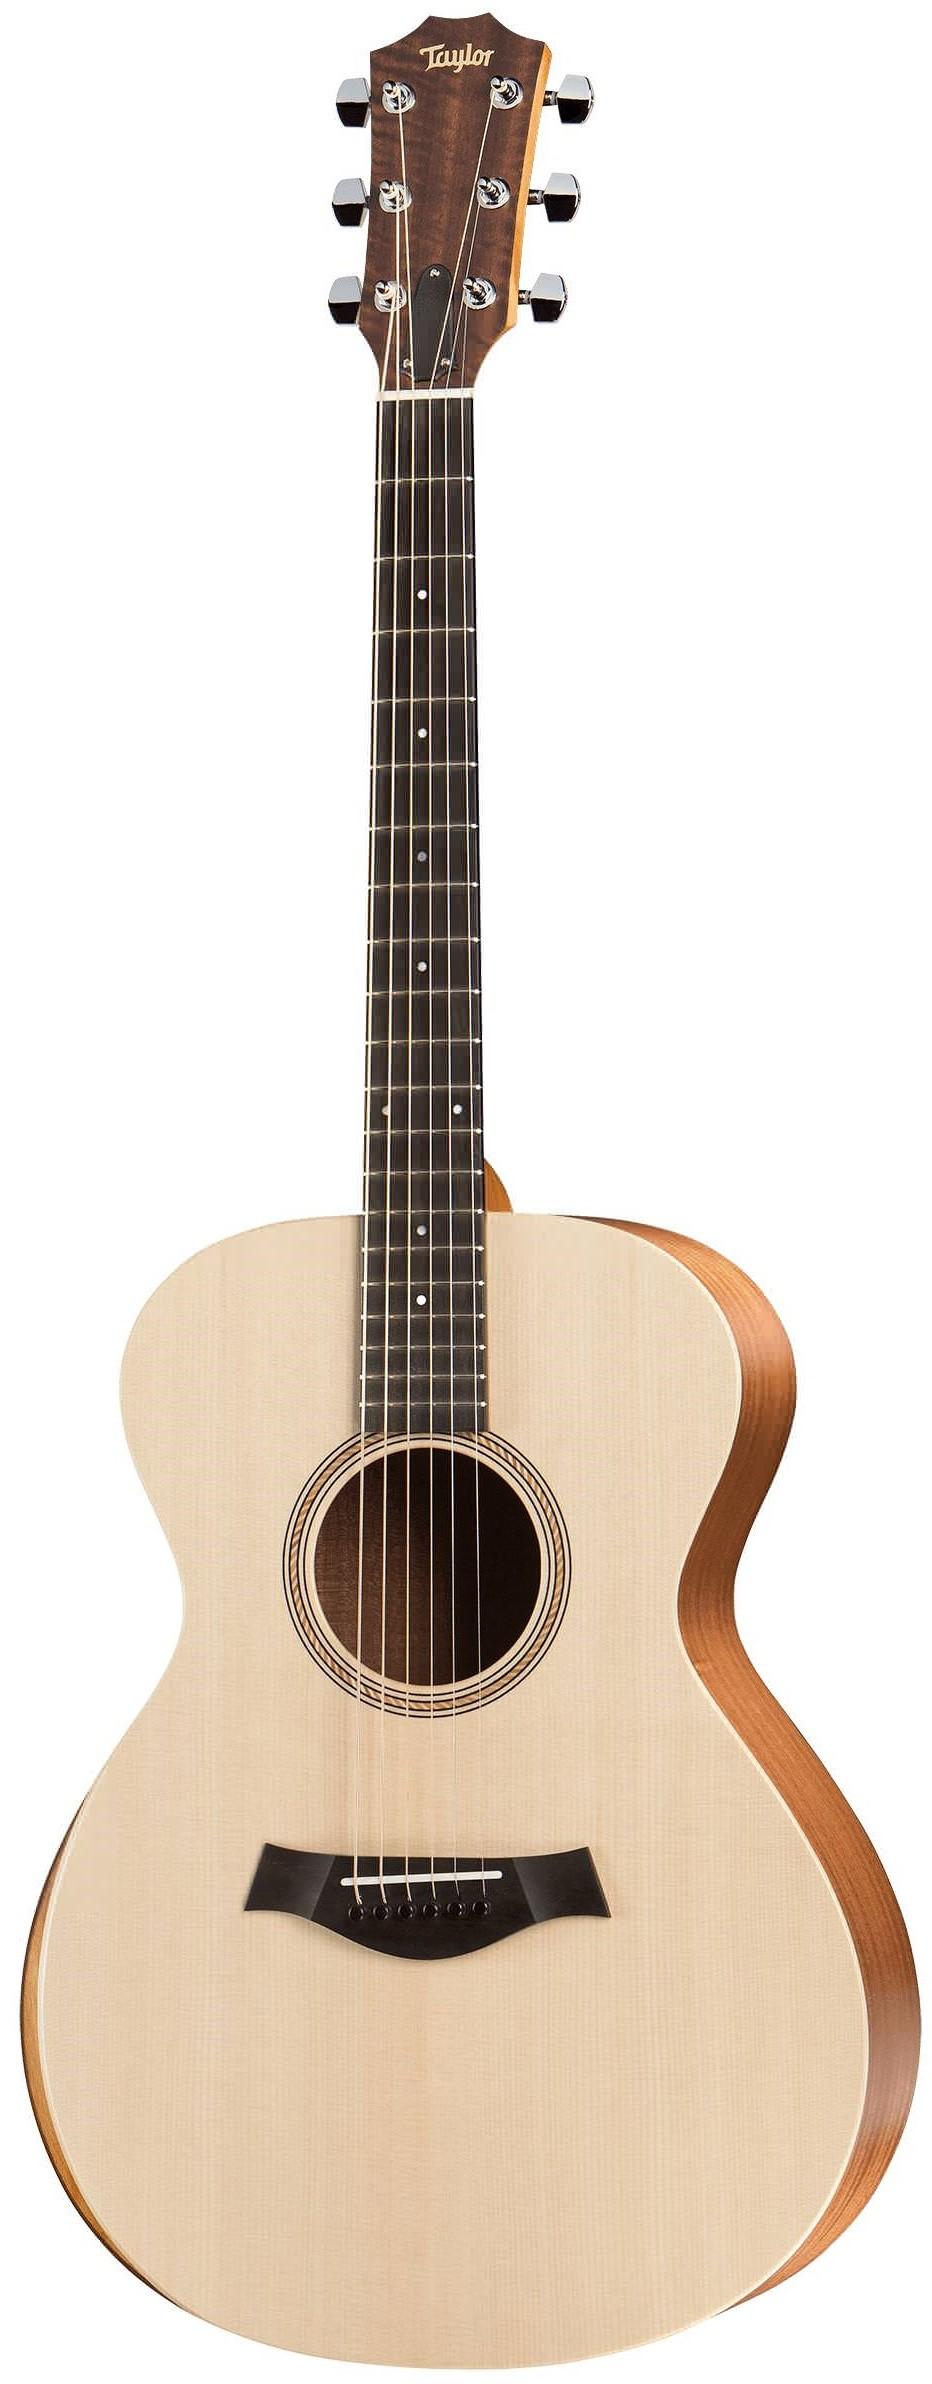 Акустическая гитара Taylor Academy 10 Academy Series Layered Sapele Sitka Spruce Top Dreadnought